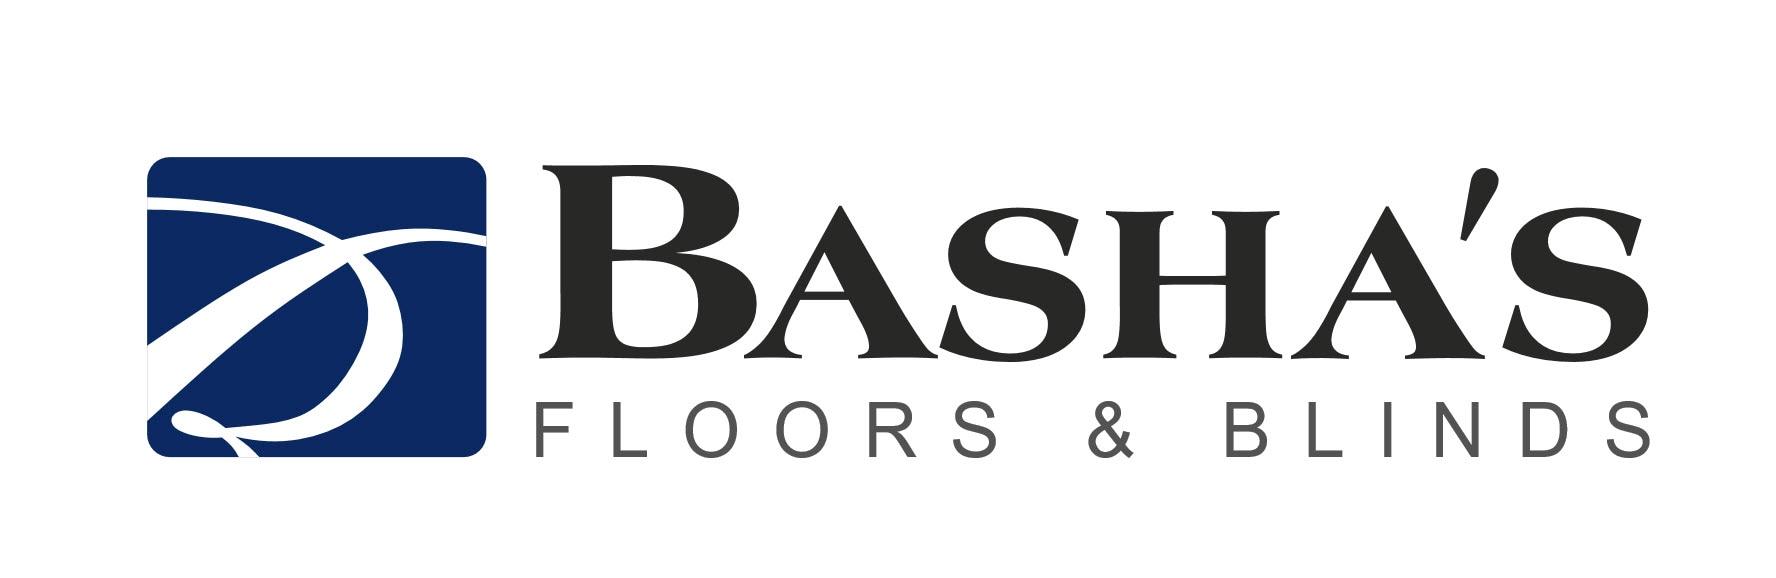 Carpet tiles carpet retailers in moruya nsw 2537 bashas floors amp blinds pty baanklon Image collections